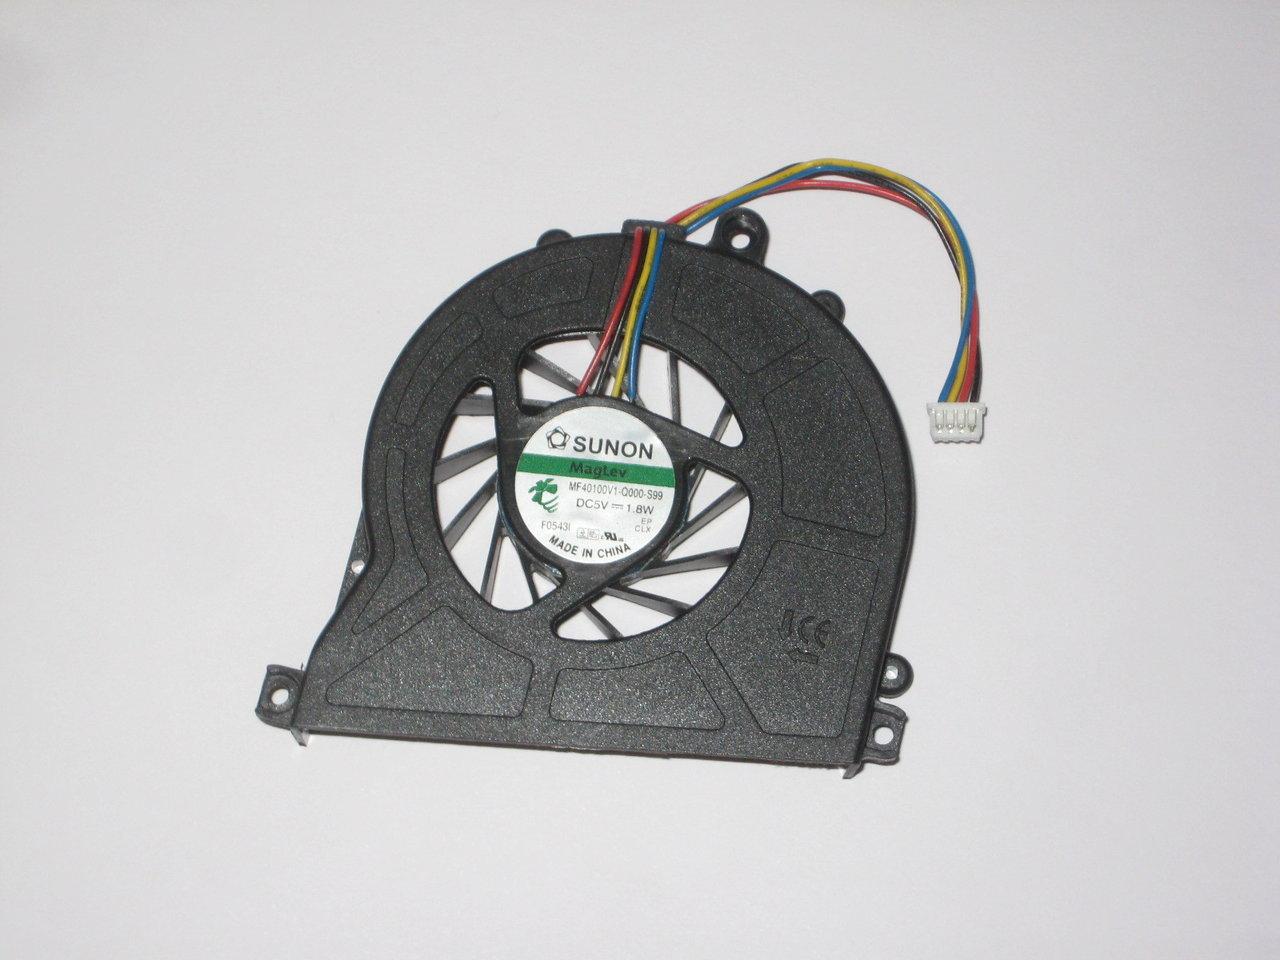 SUNON Kühler Lüfter für Acer Aspire Revo R3610, R3700 Mini PC